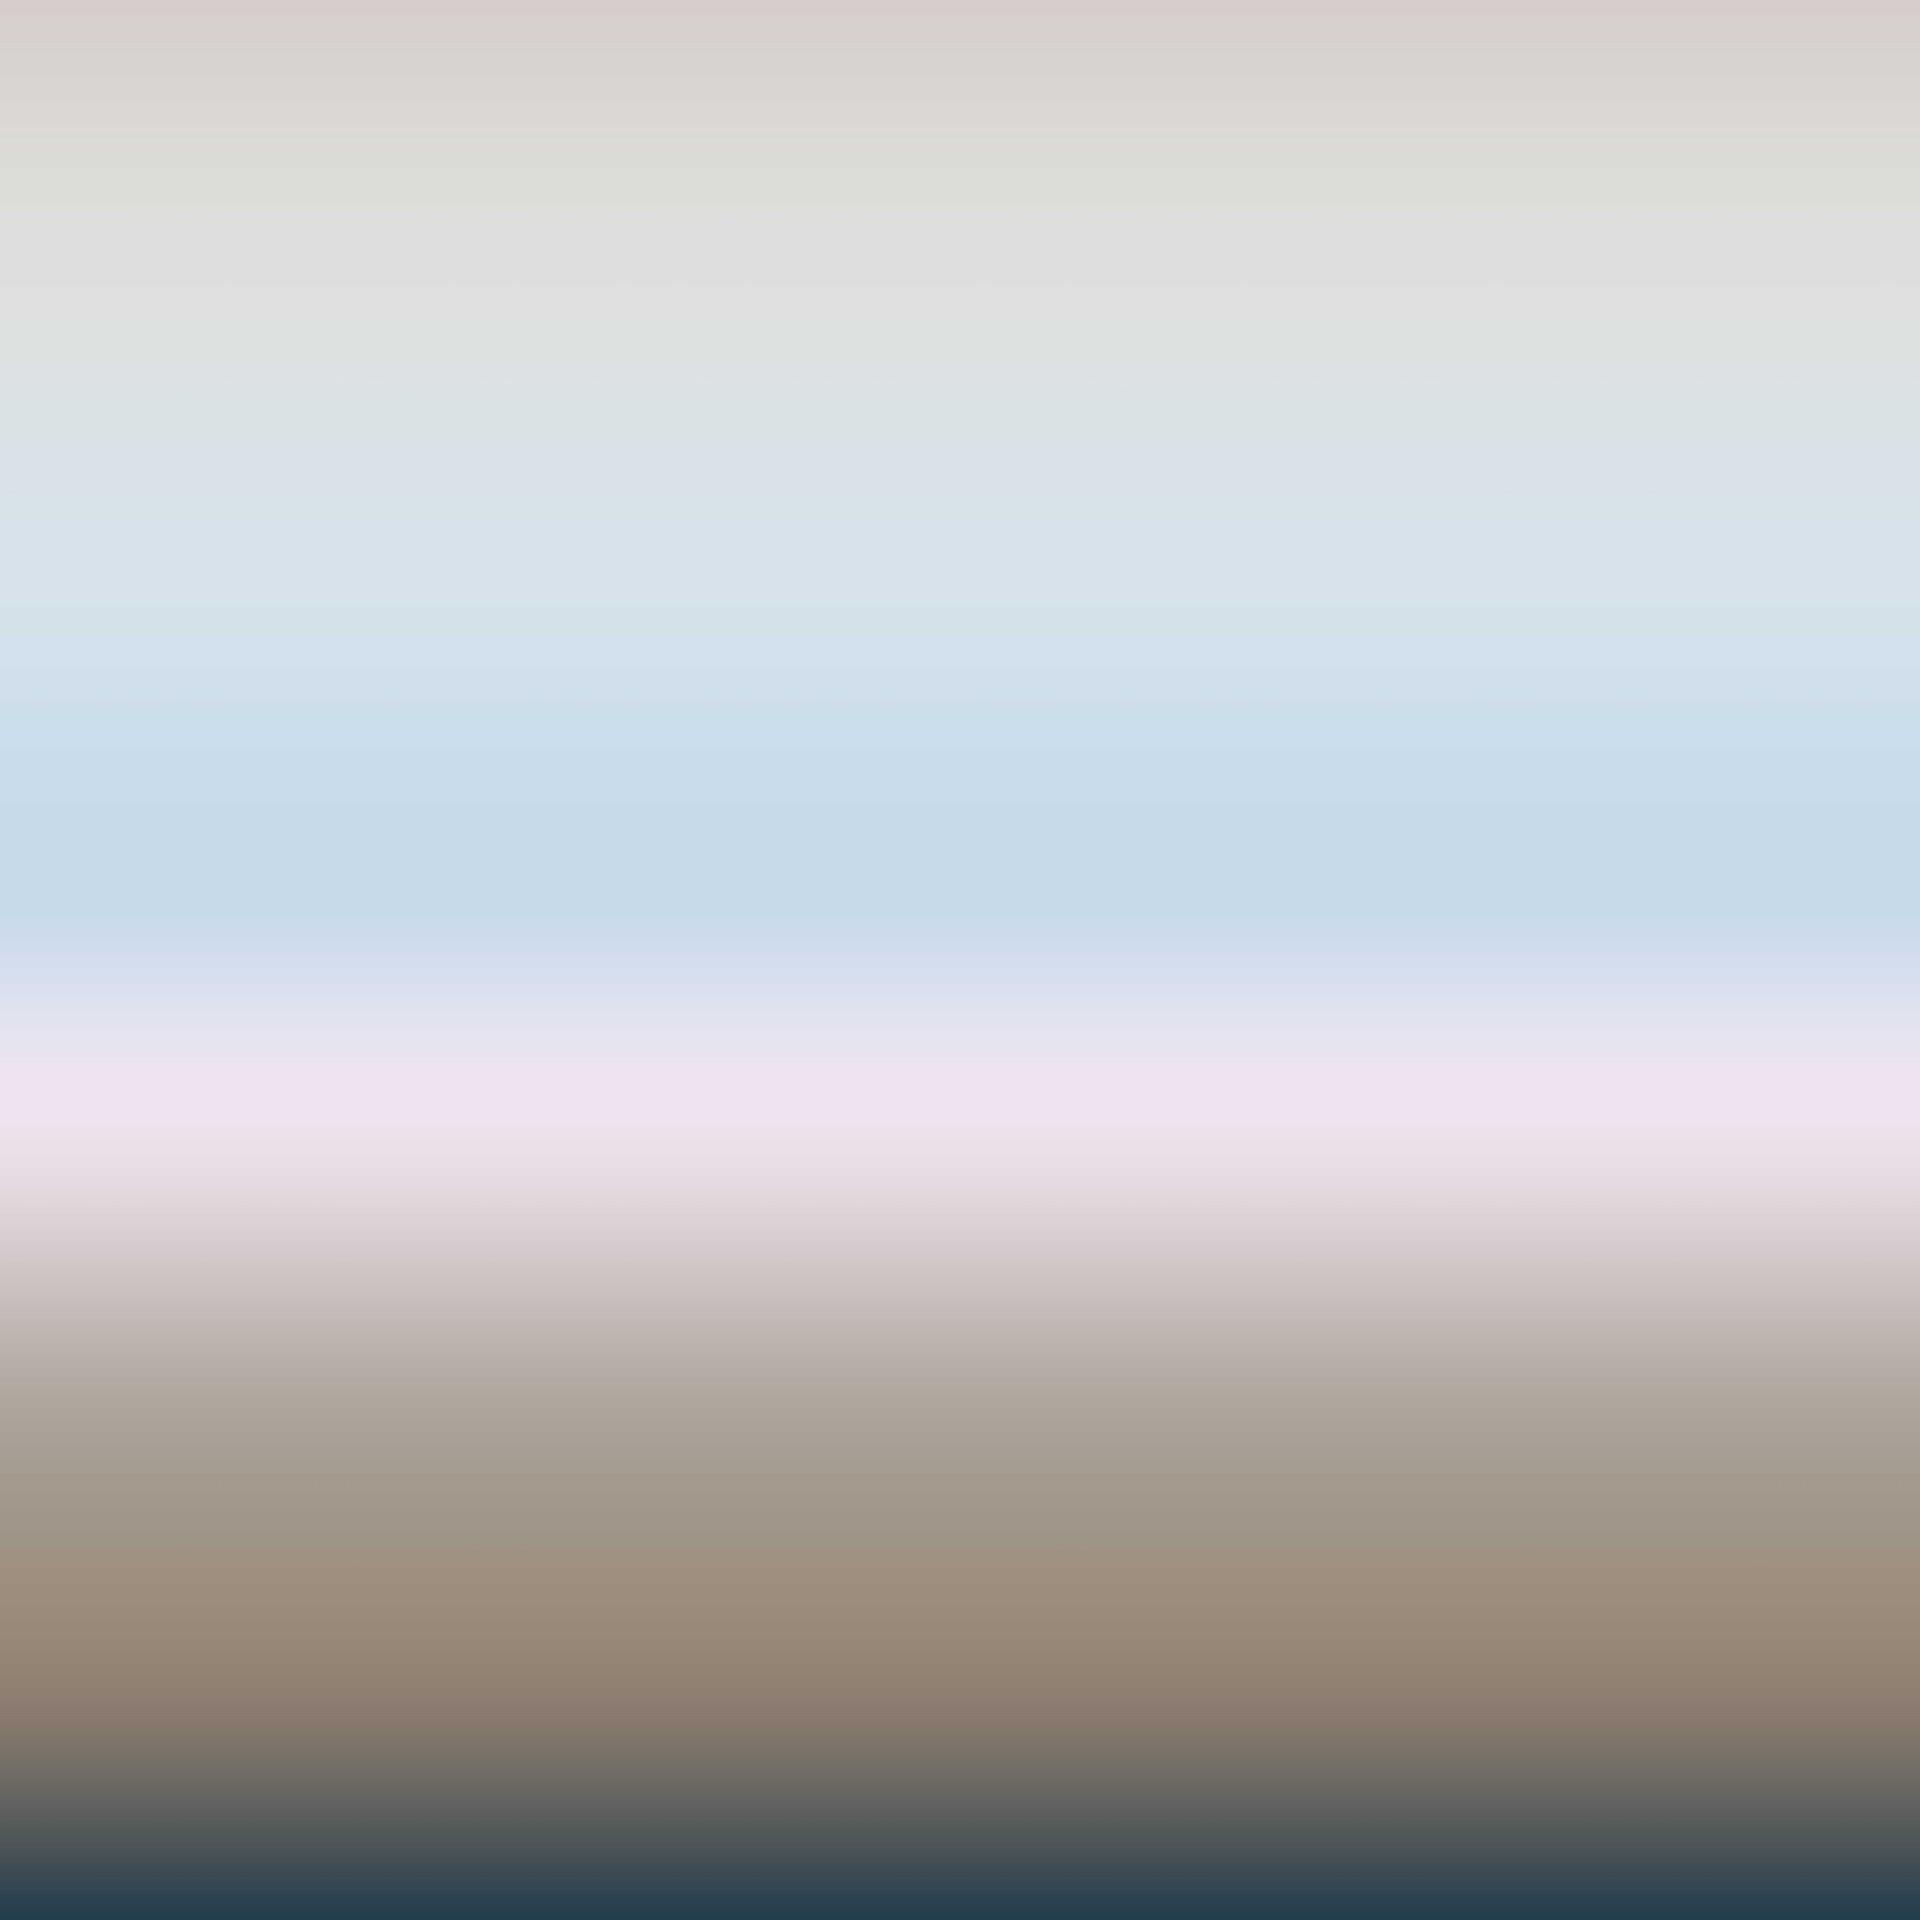 Wallpaper Ombre: Purple Ombre Wallpaper (68+ Images